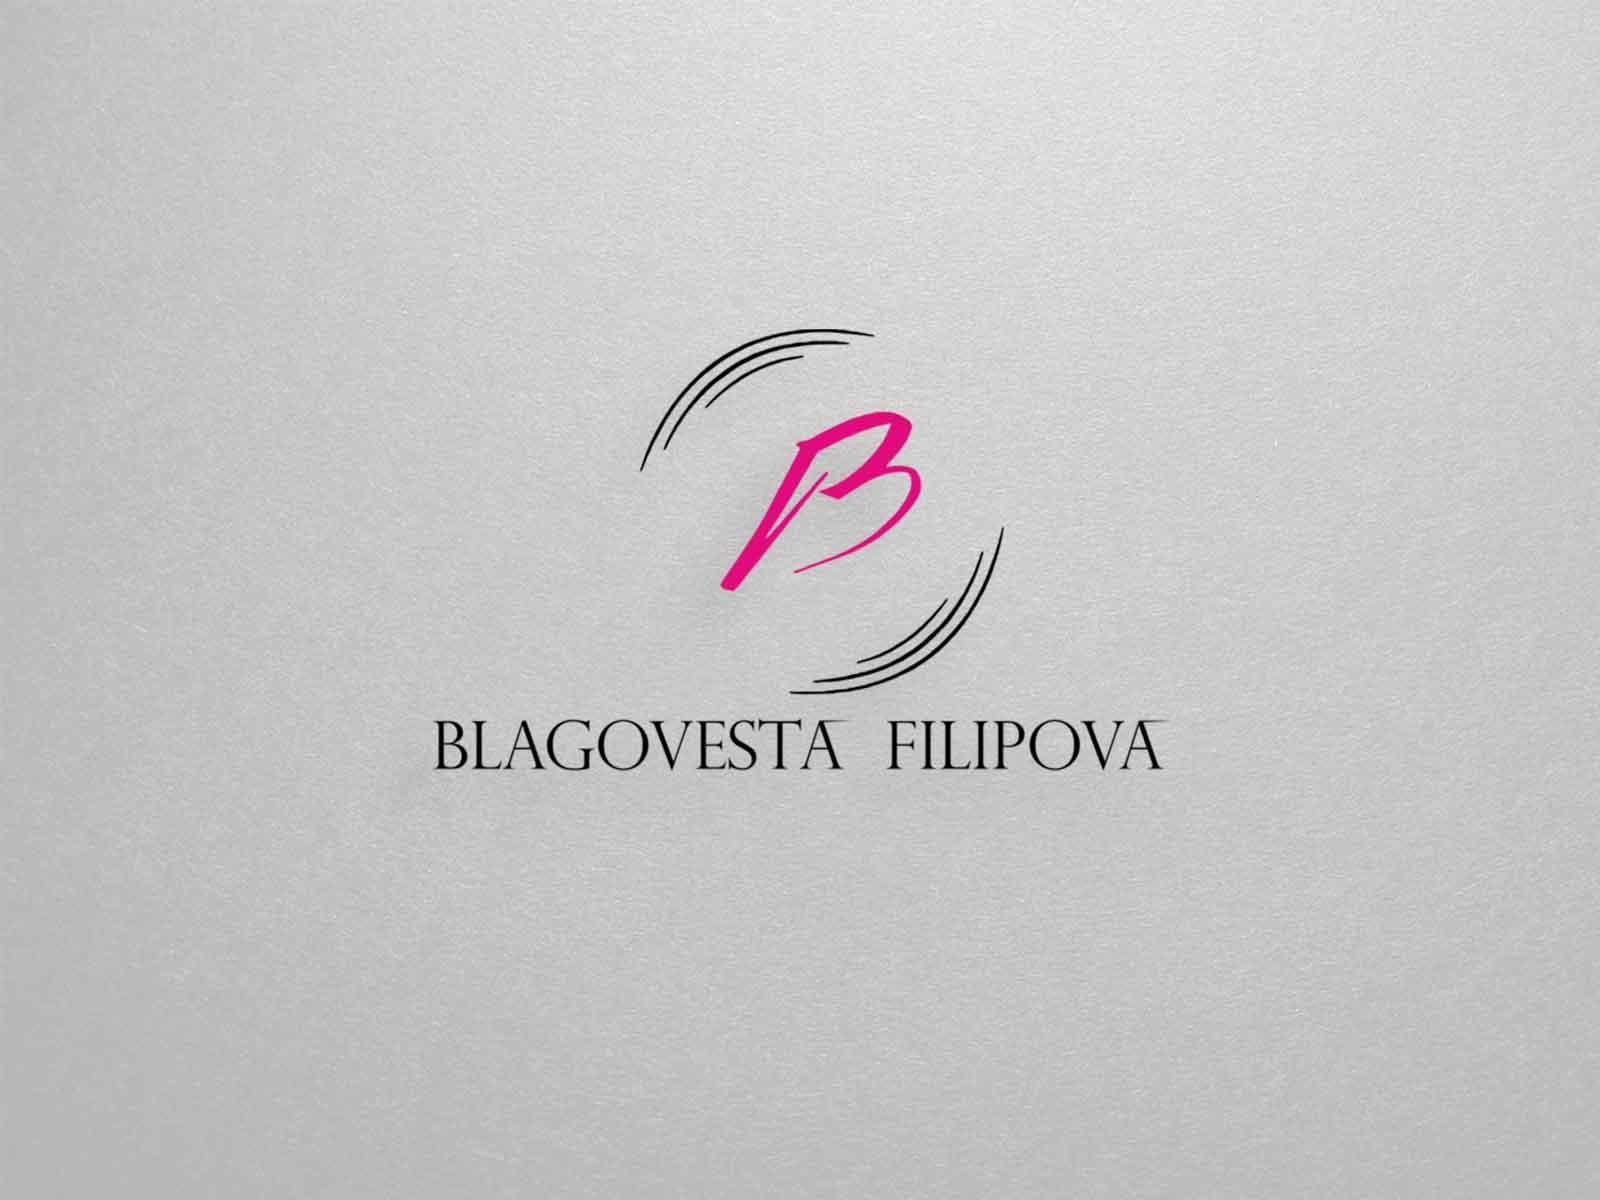 blagovestafilipova-лого-изработка-на-уебсайт-linkbox